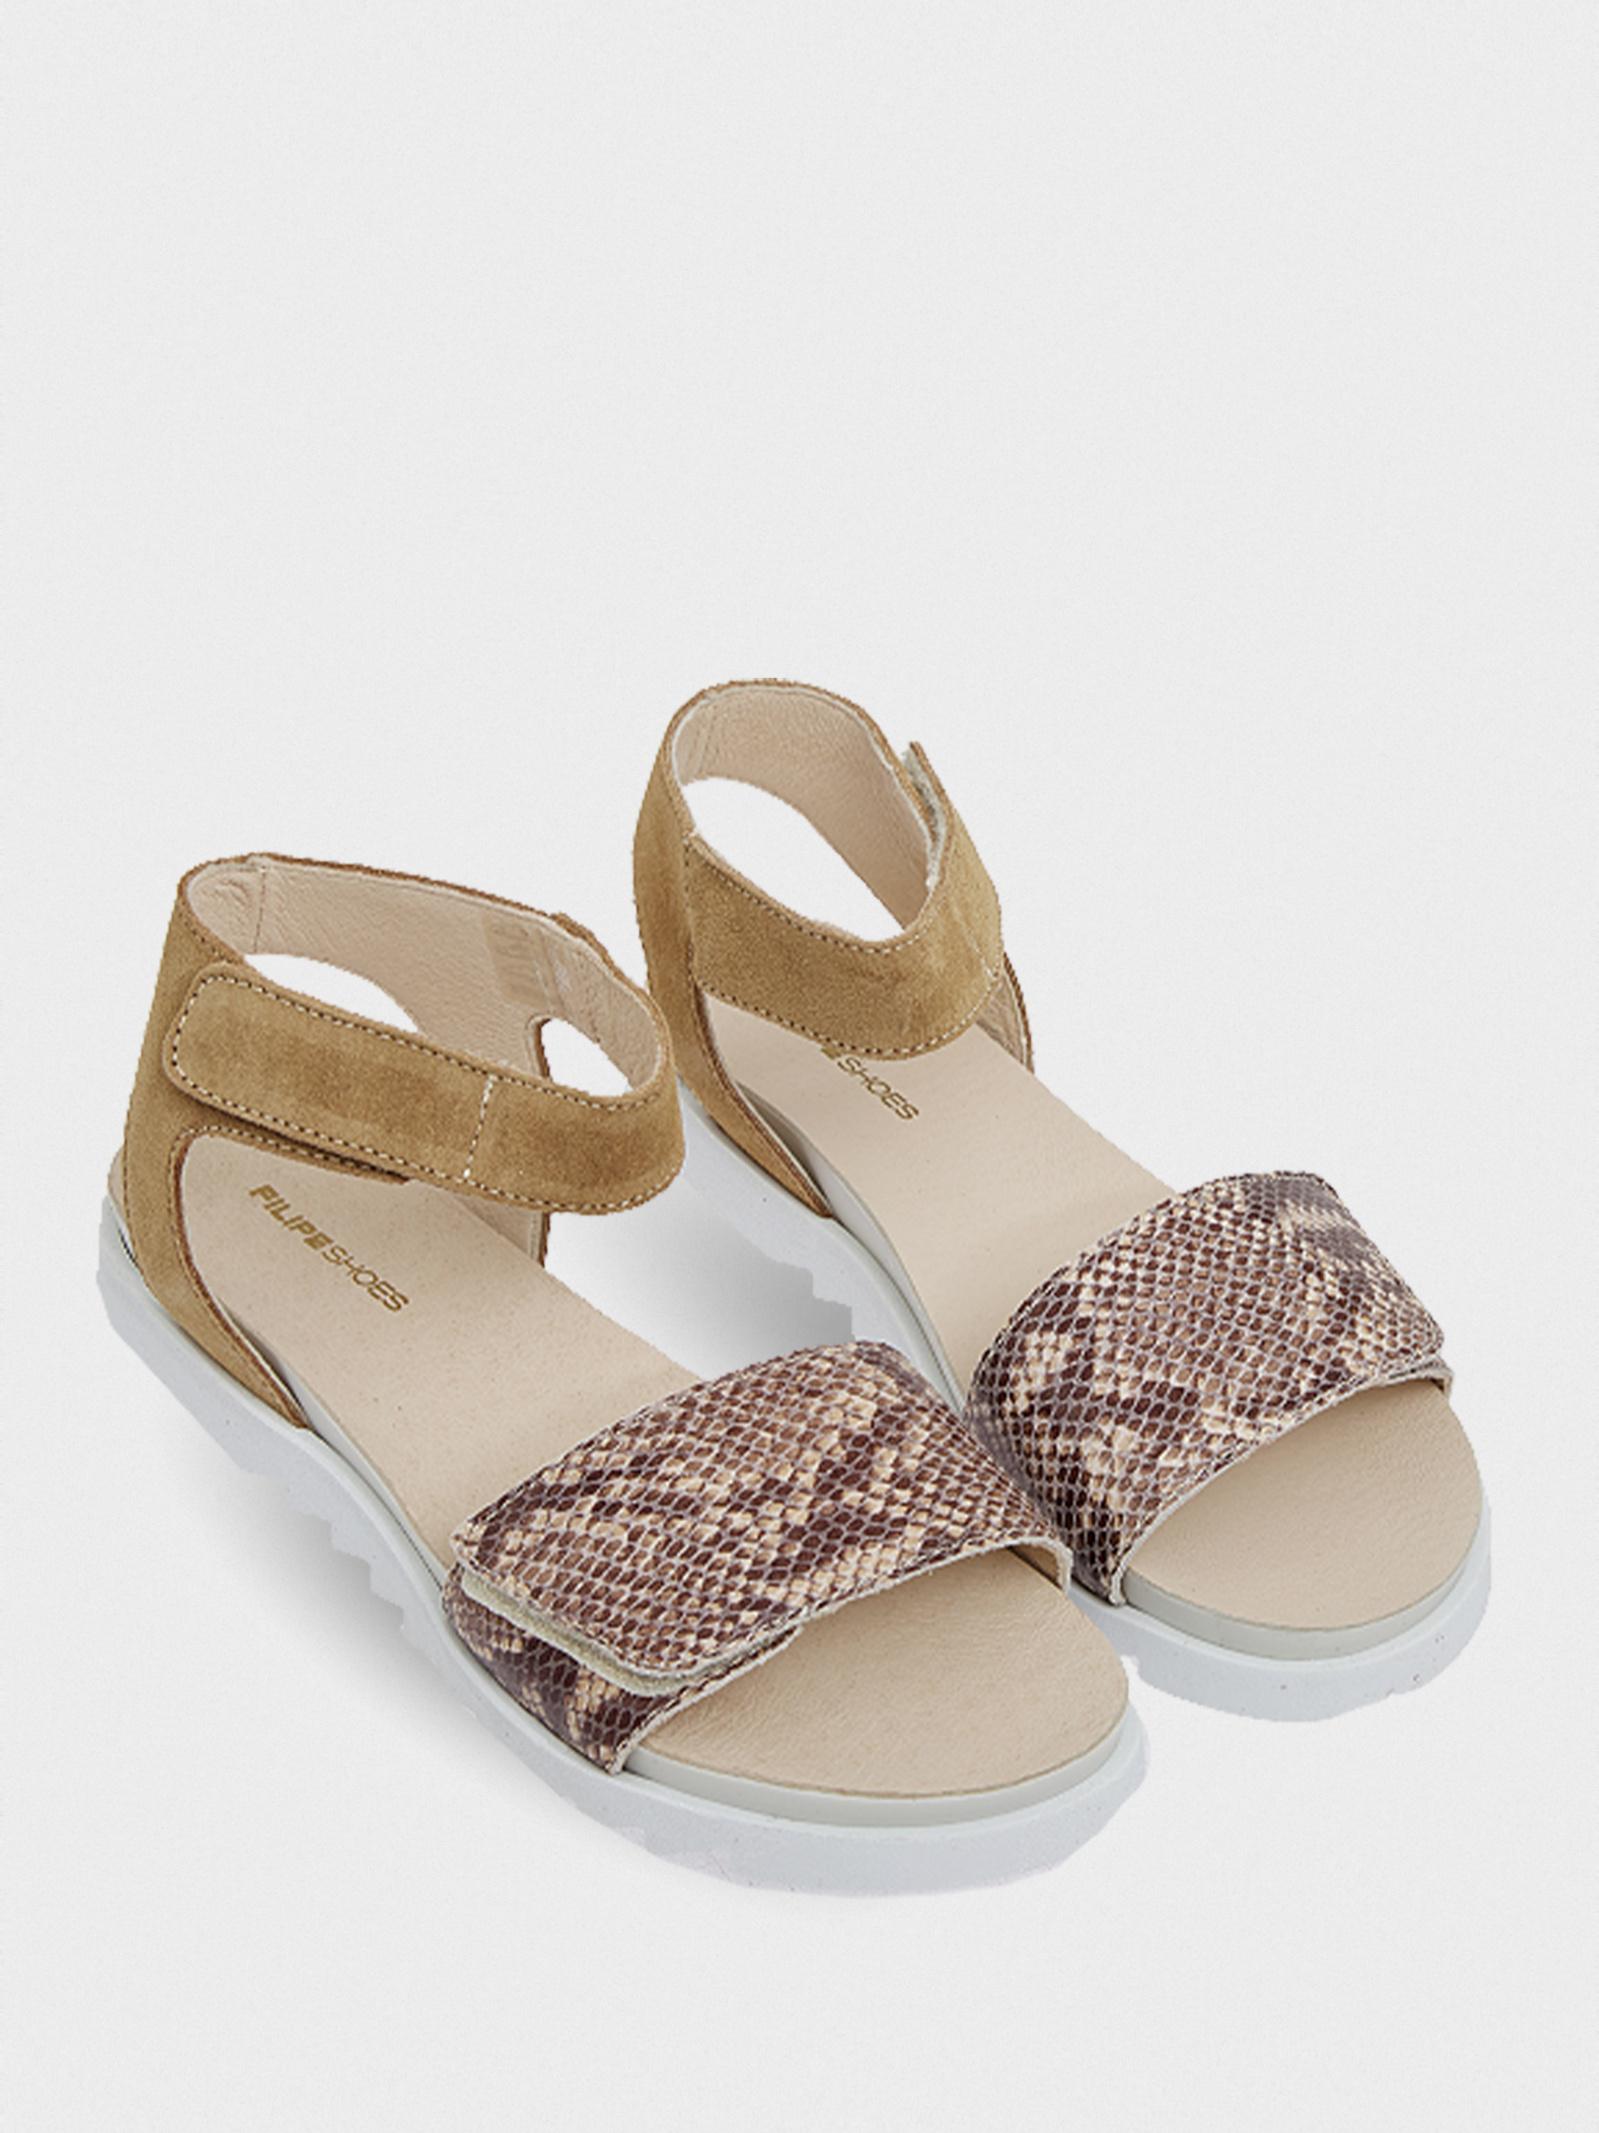 Сандалии женские Filipe Shoes 10076 продажа, 2017